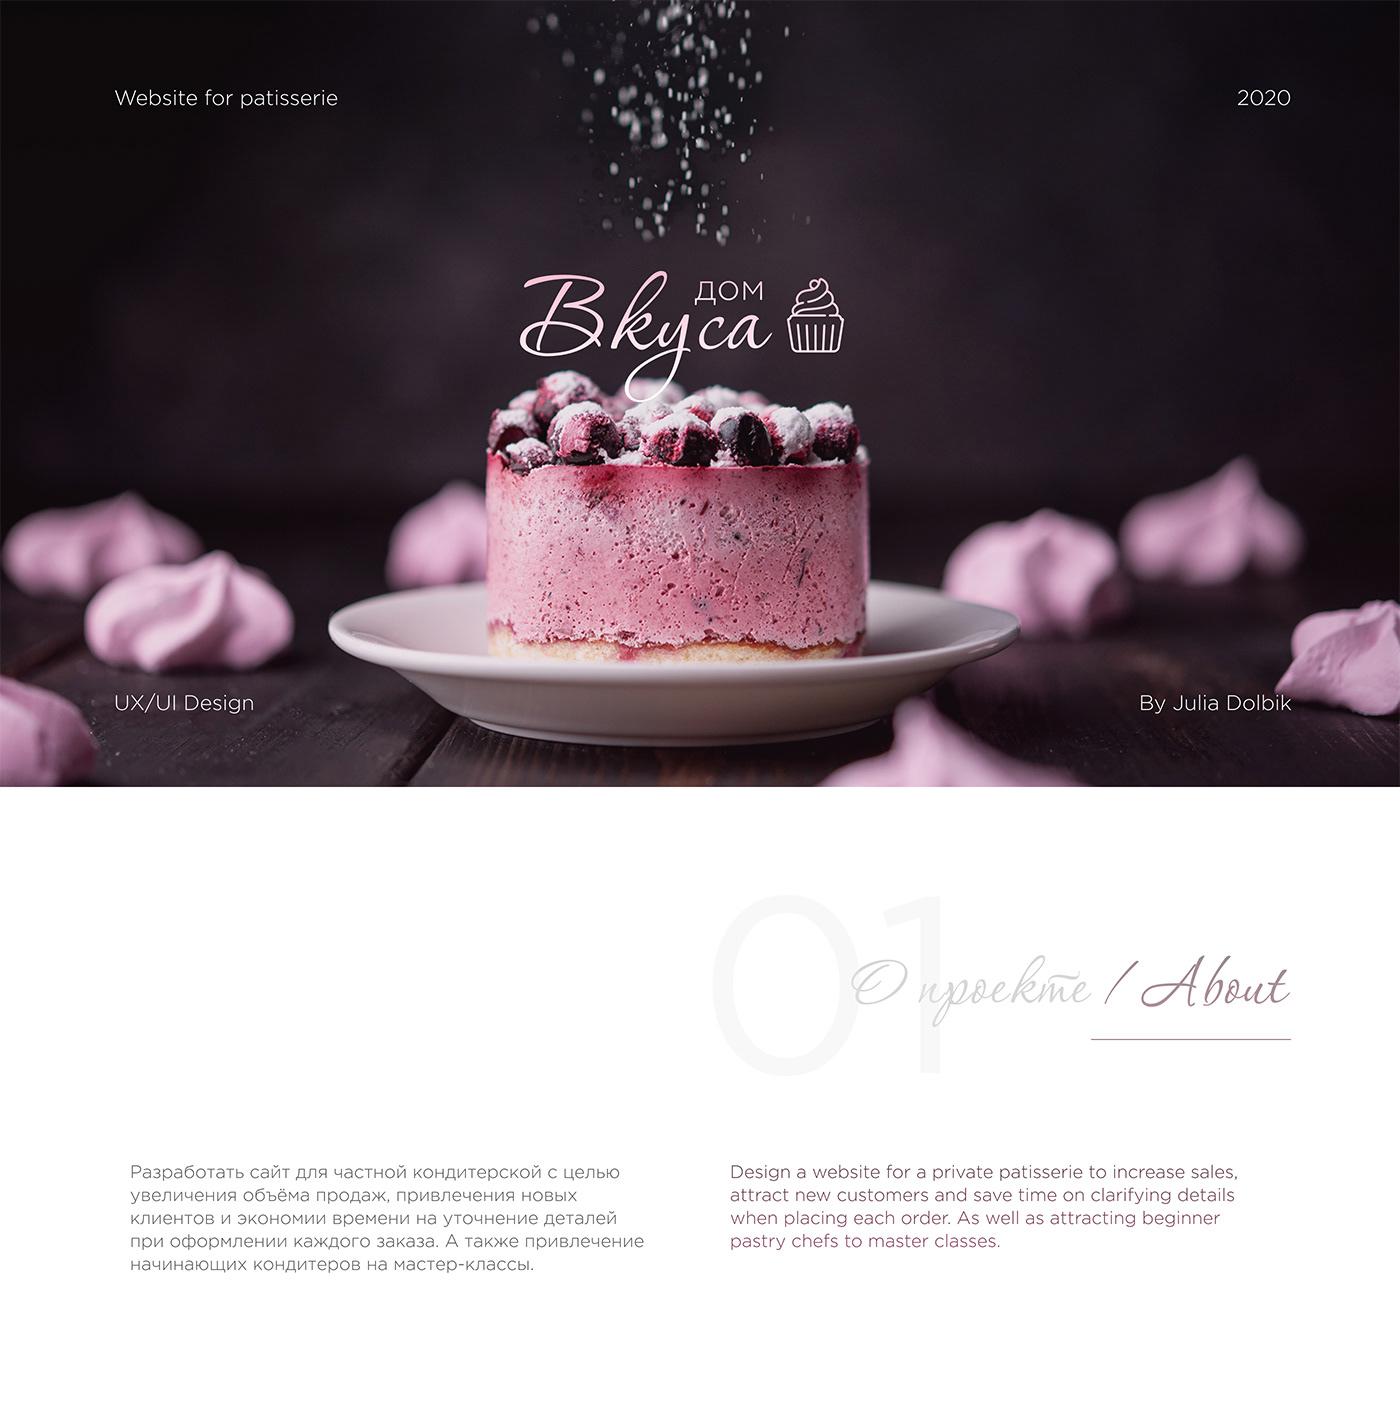 #webdesign,#website,#interface,#photoshop,#uiux,#userexperience,#uxdesign,#web  ,#вебдизайн,#cakes